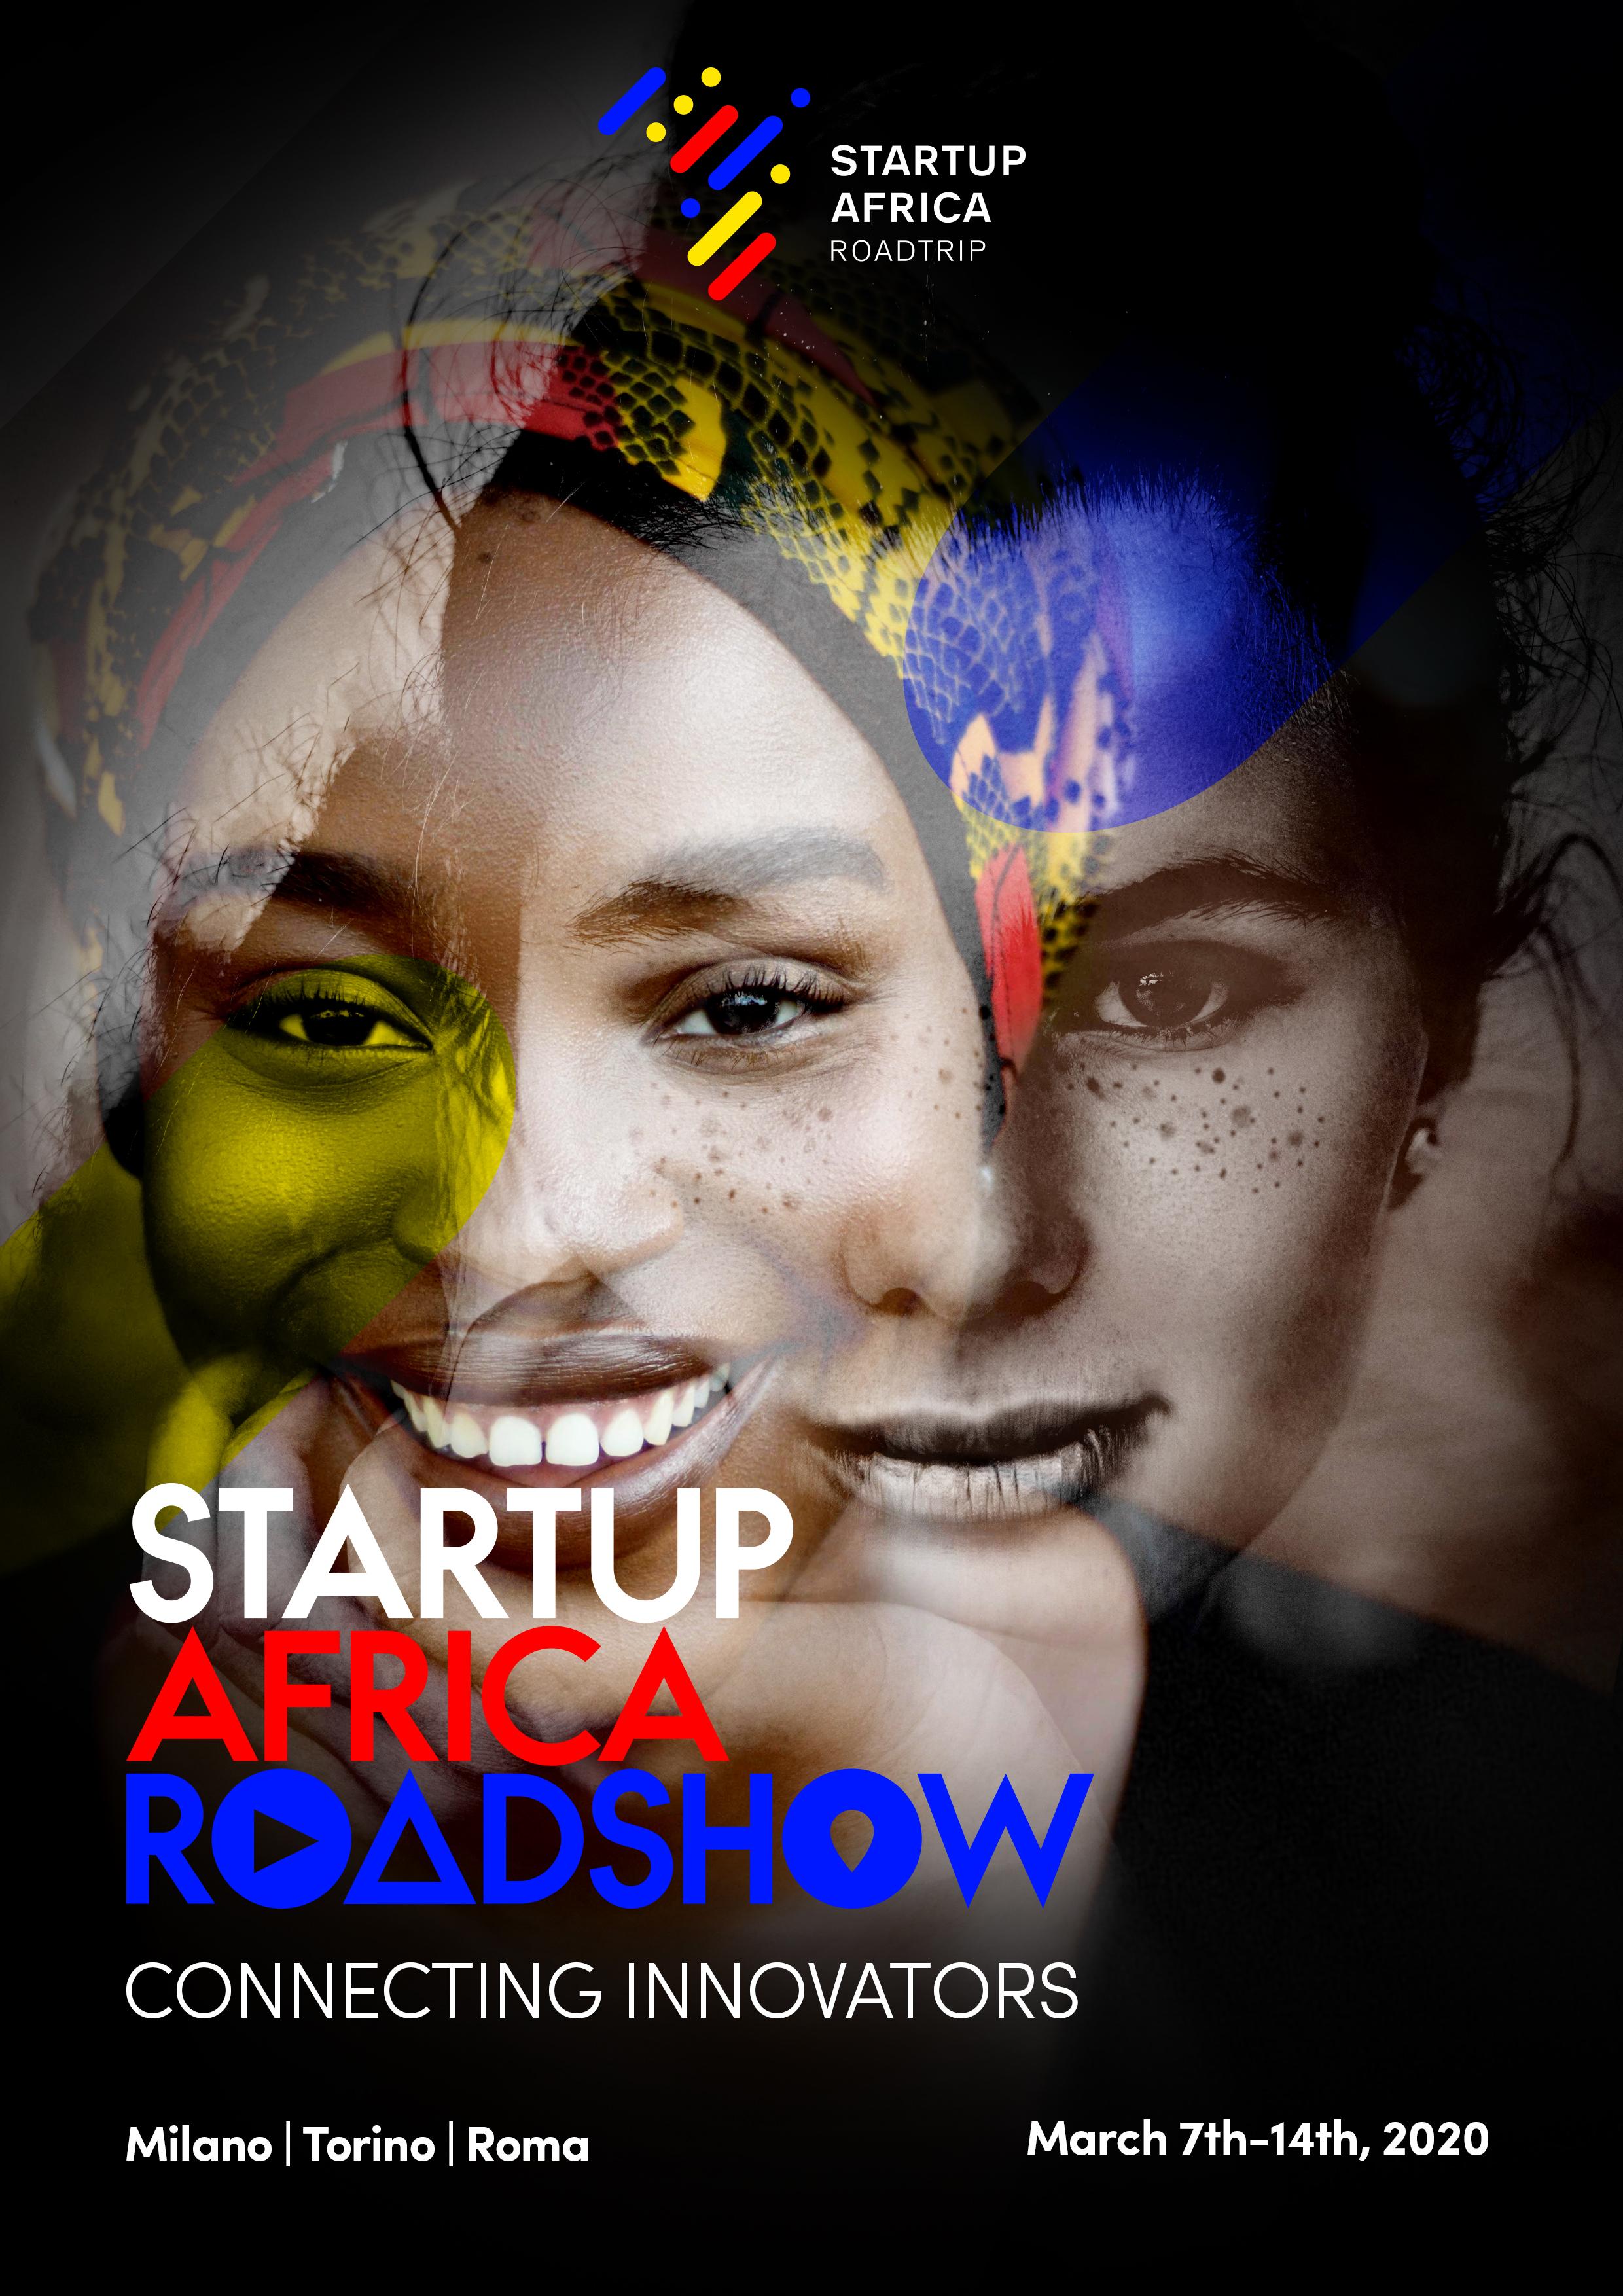 Startup Africa Roadtrip 2020